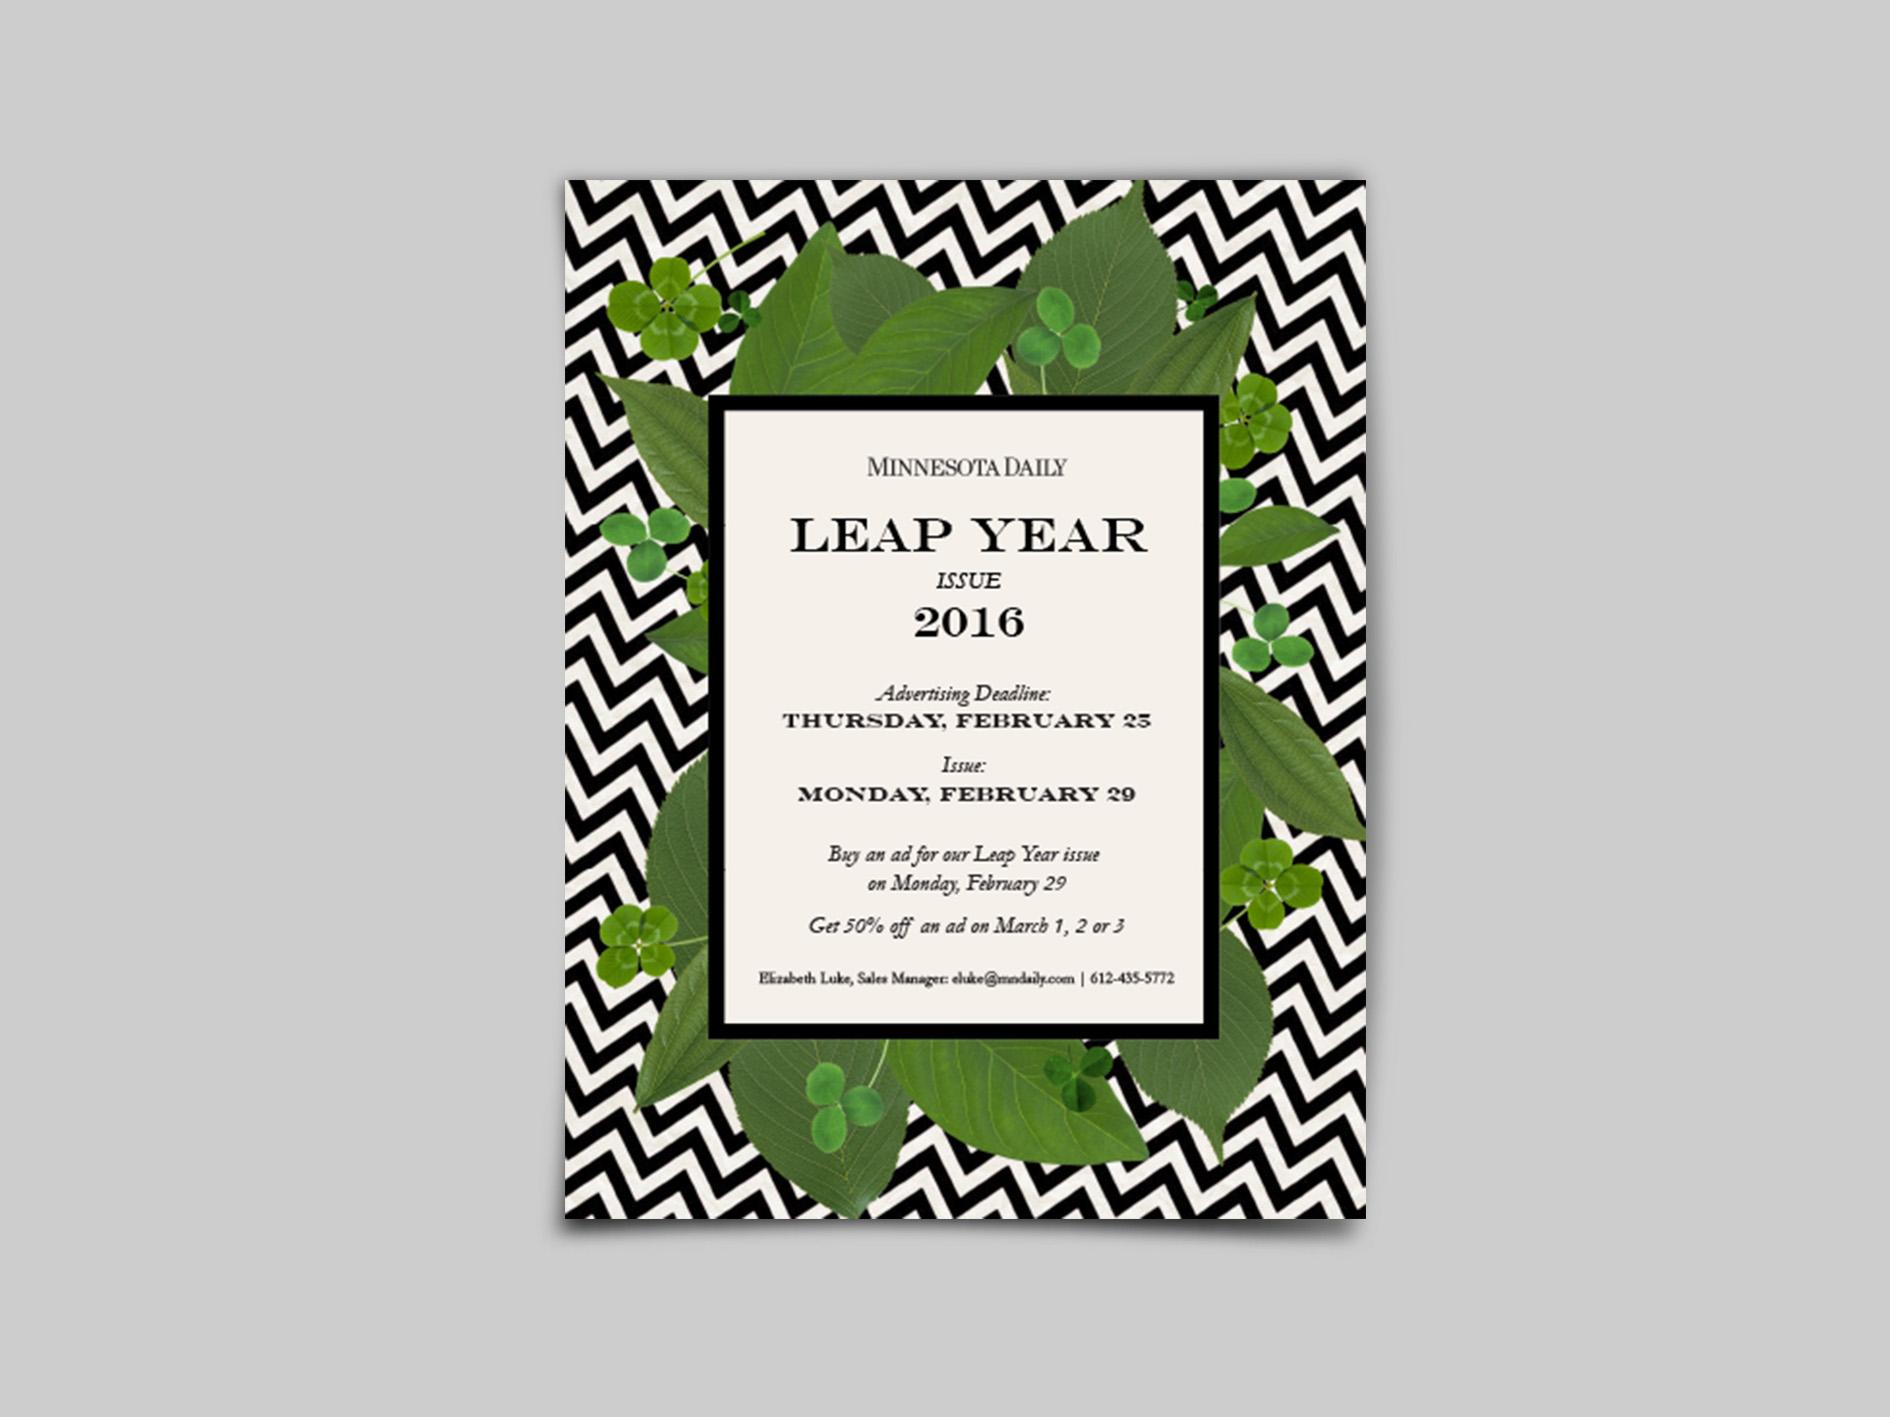 leap year infosheet mockup.jpg